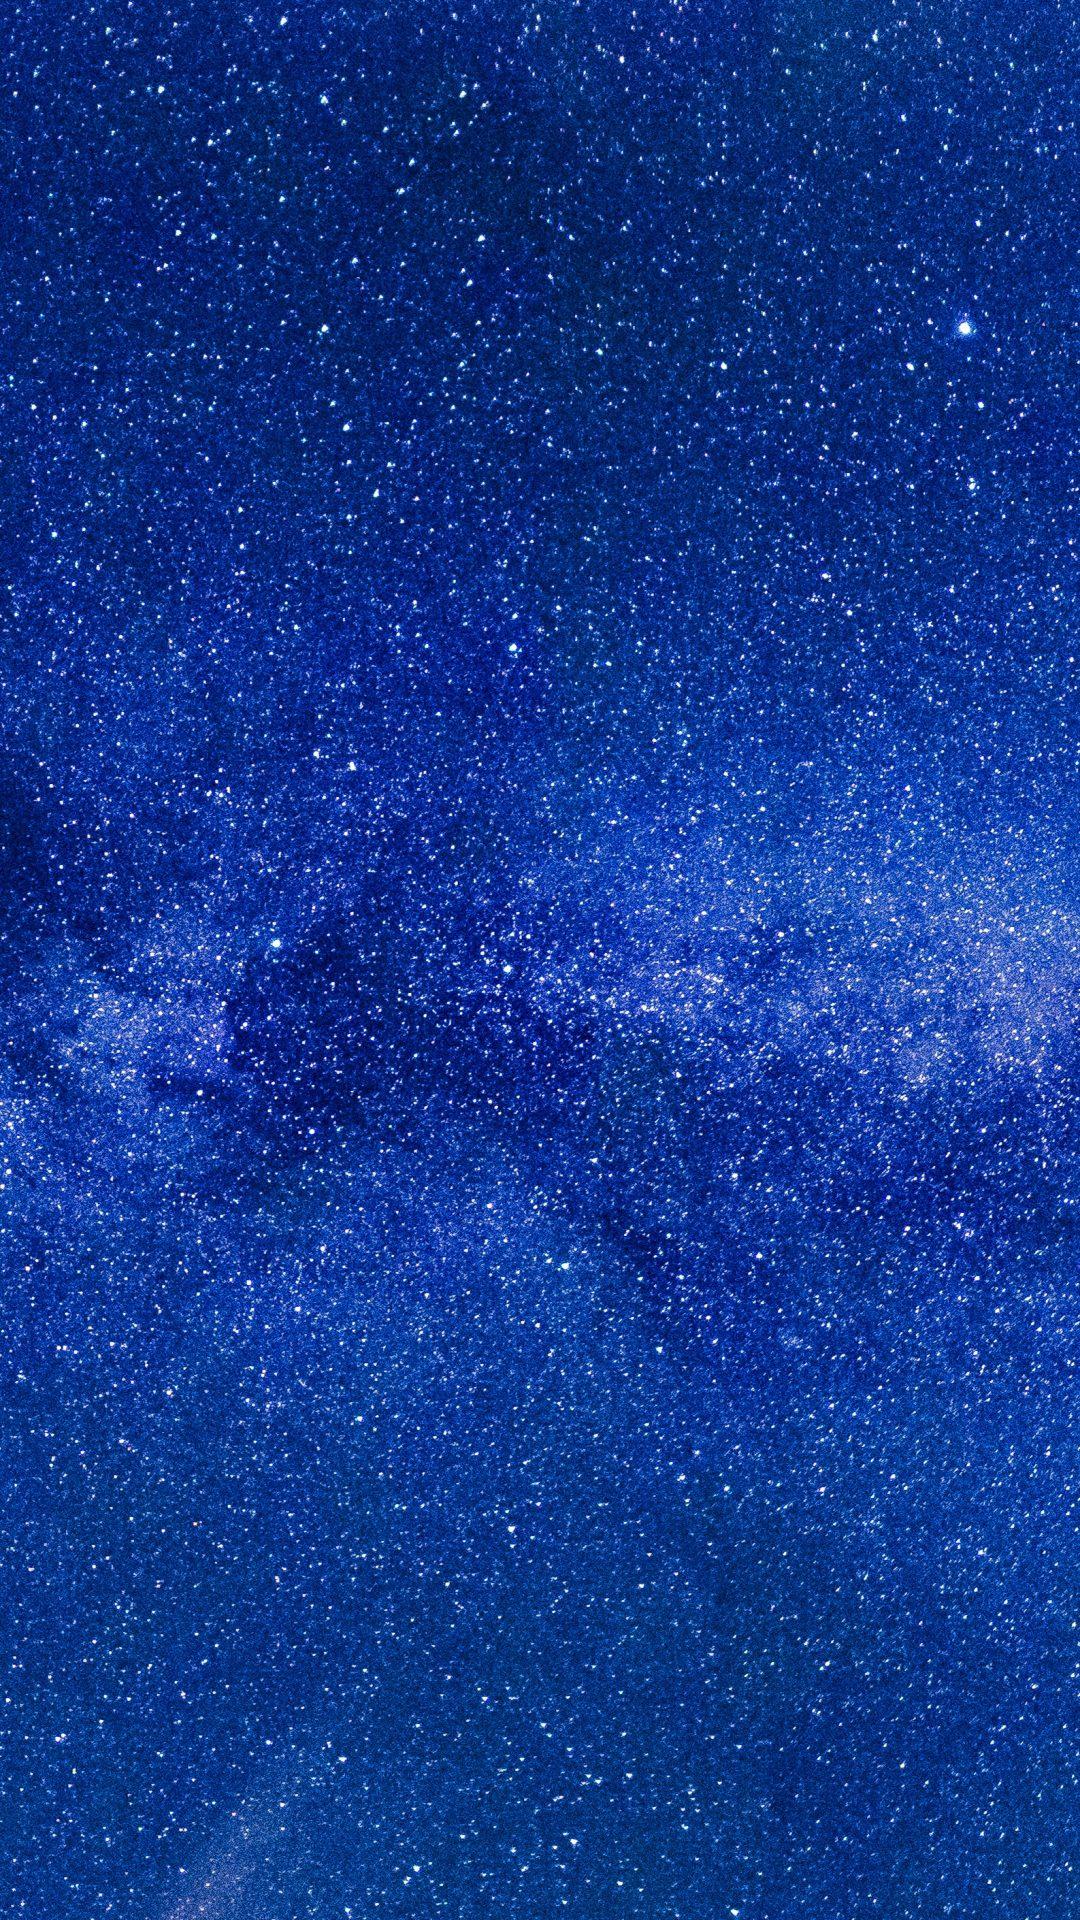 Space Wallpaper Iphone 4 Light Blue Starry Sky 4k Uhd Wallpaper